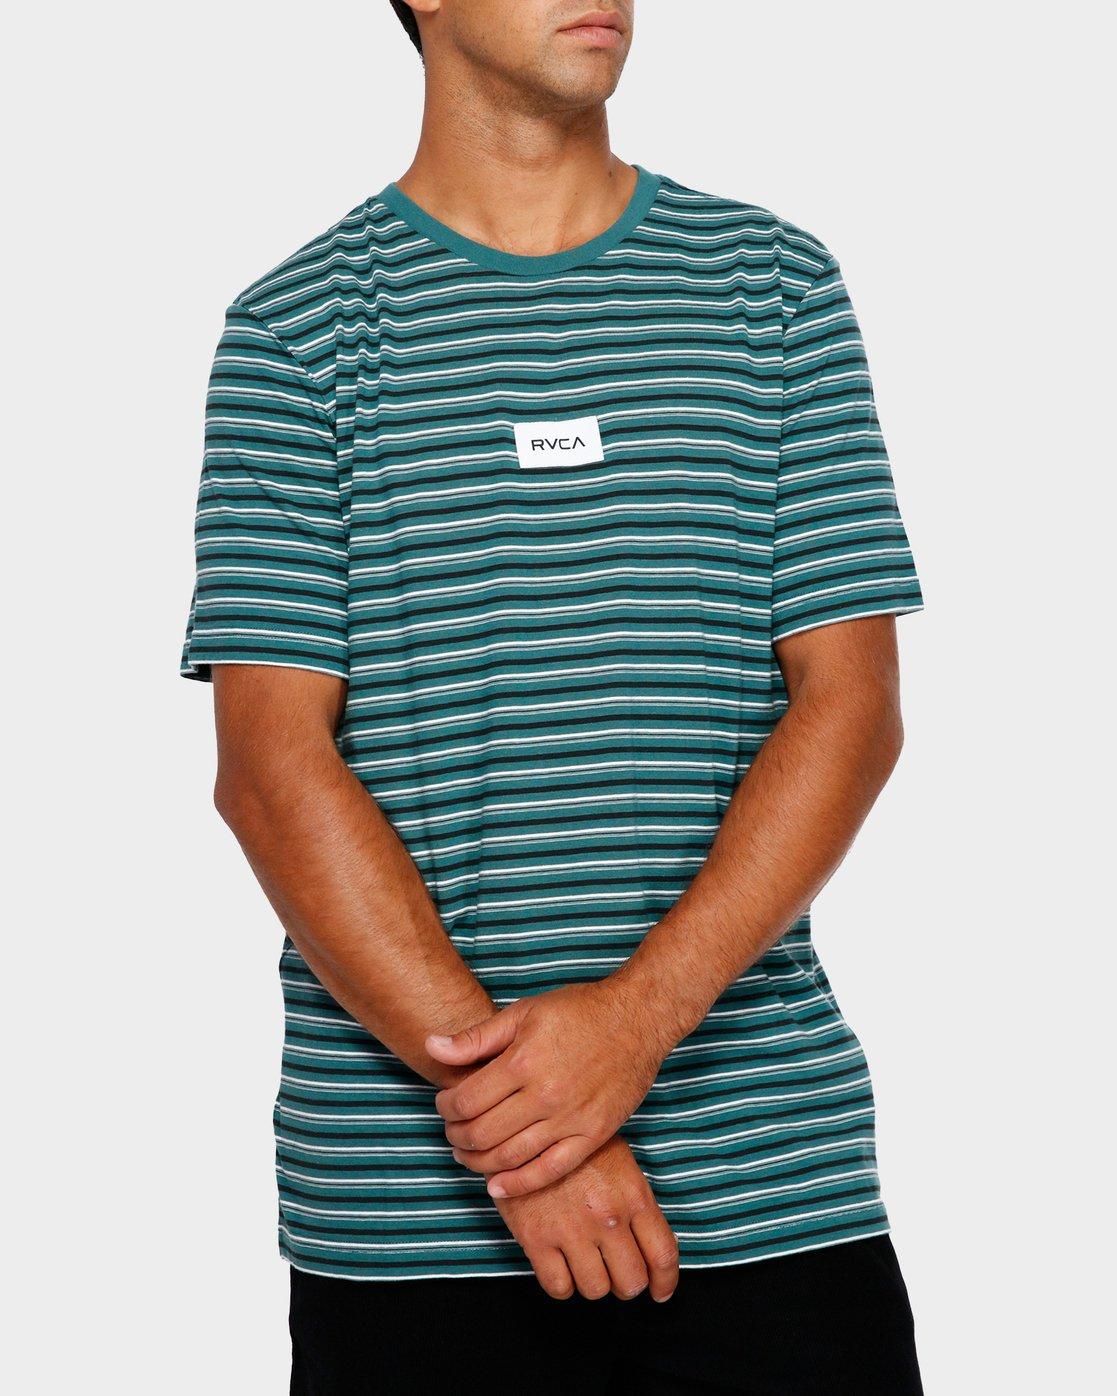 0 RVCA Focus Stripe T-Shirt Green R191049 RVCA